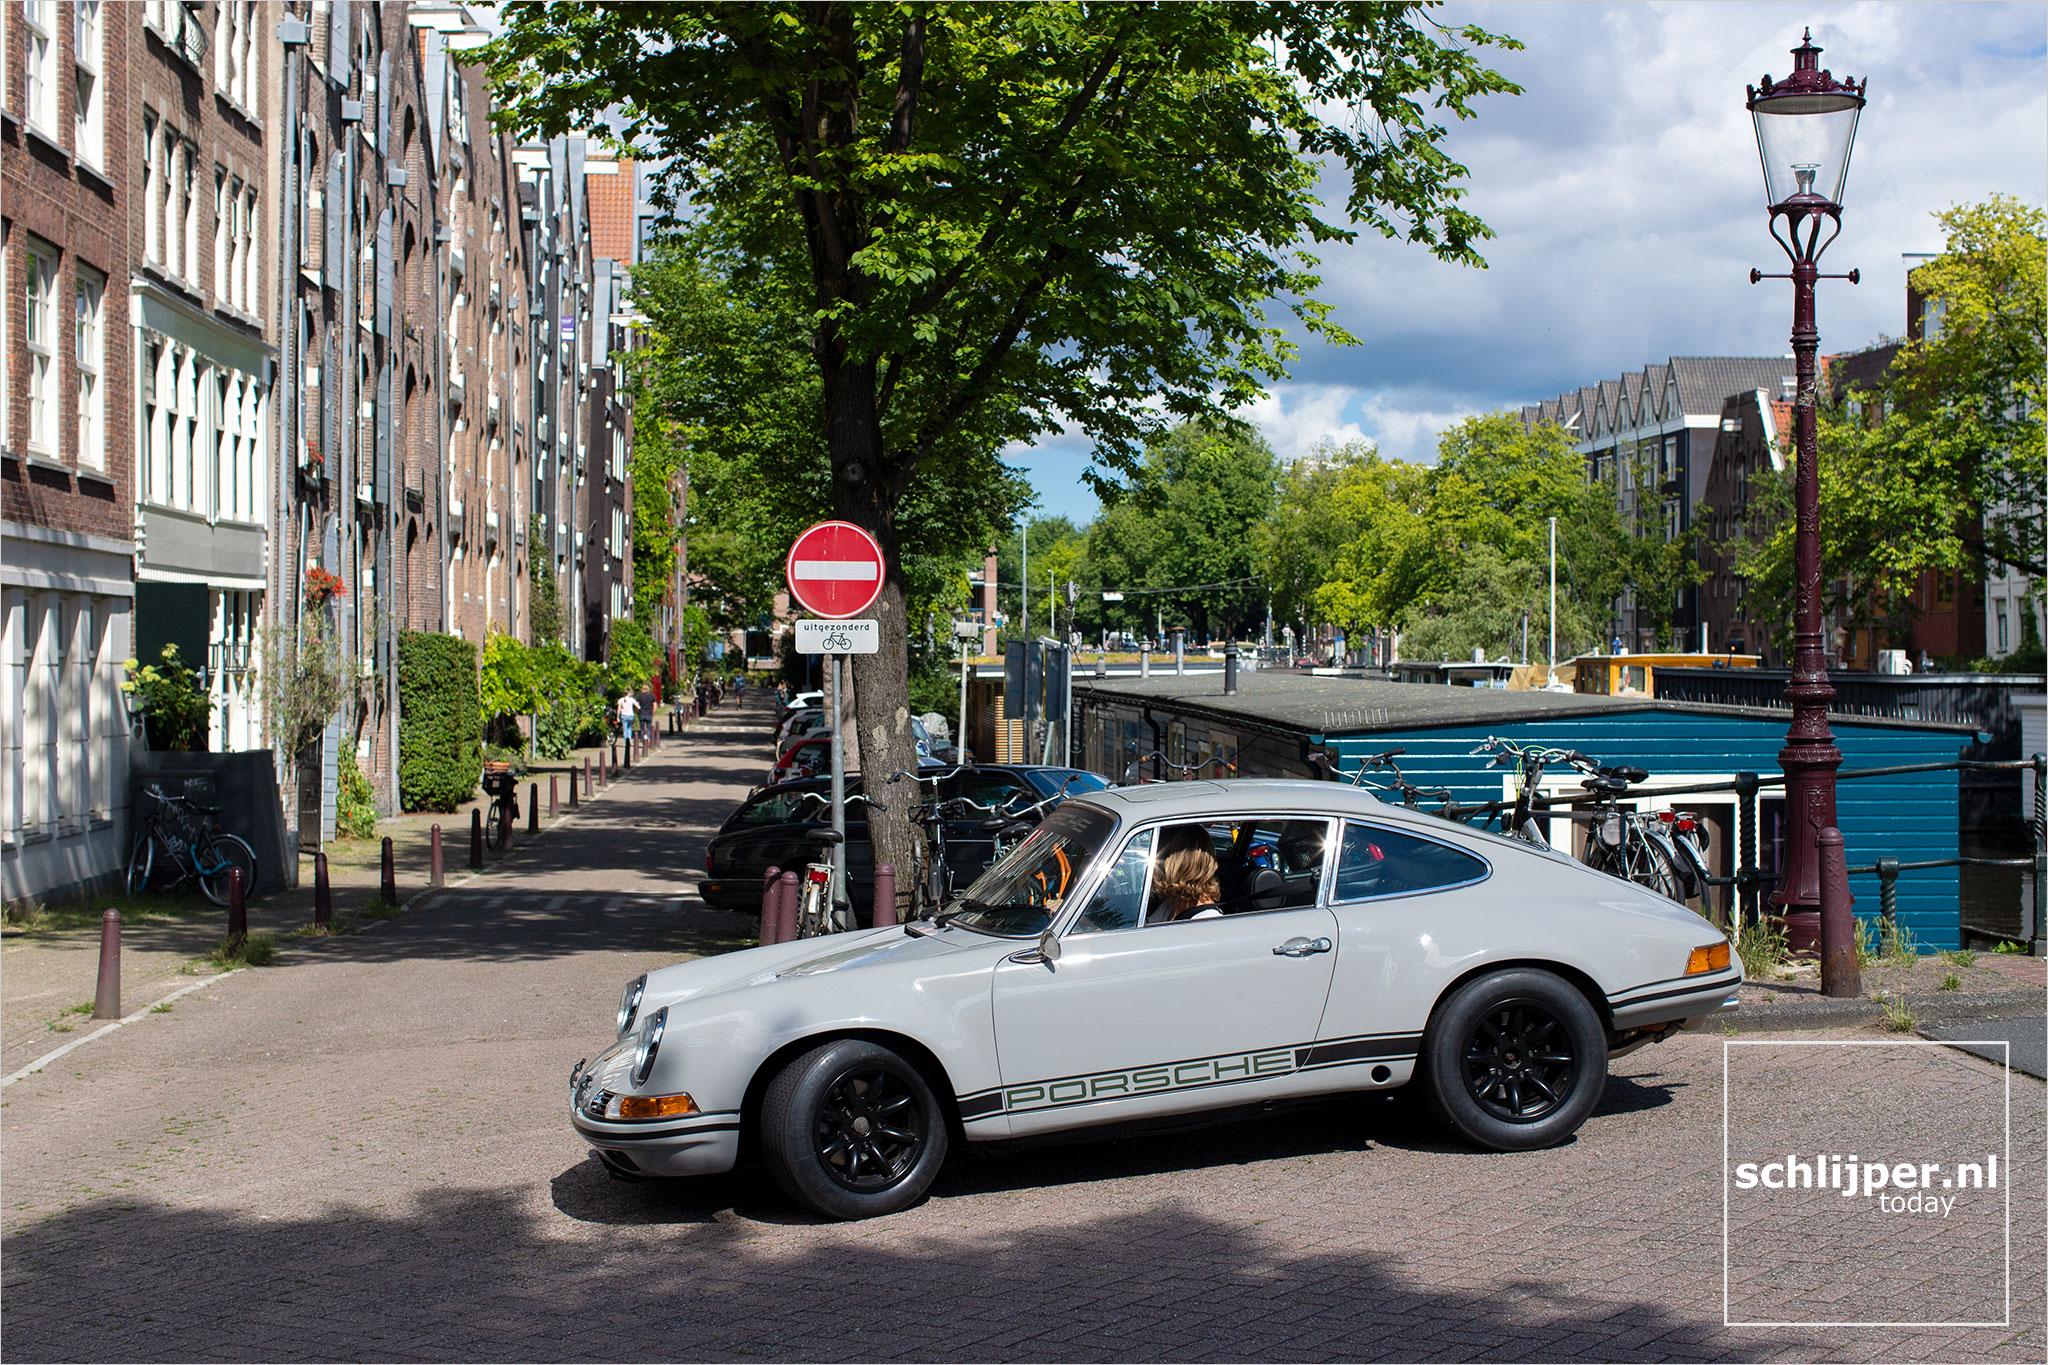 The Netherlands, Amsterdam, 12 juli 2020